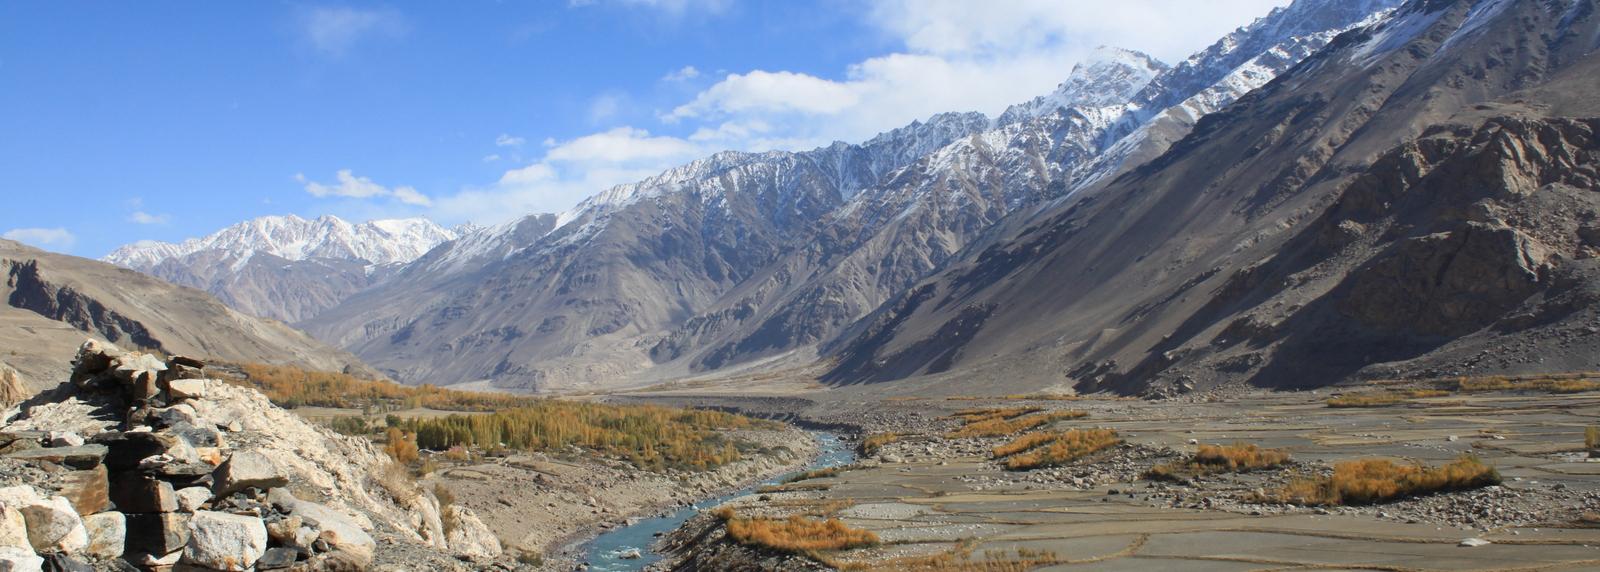 View from Khaakha Fortress, Tadzjikistan